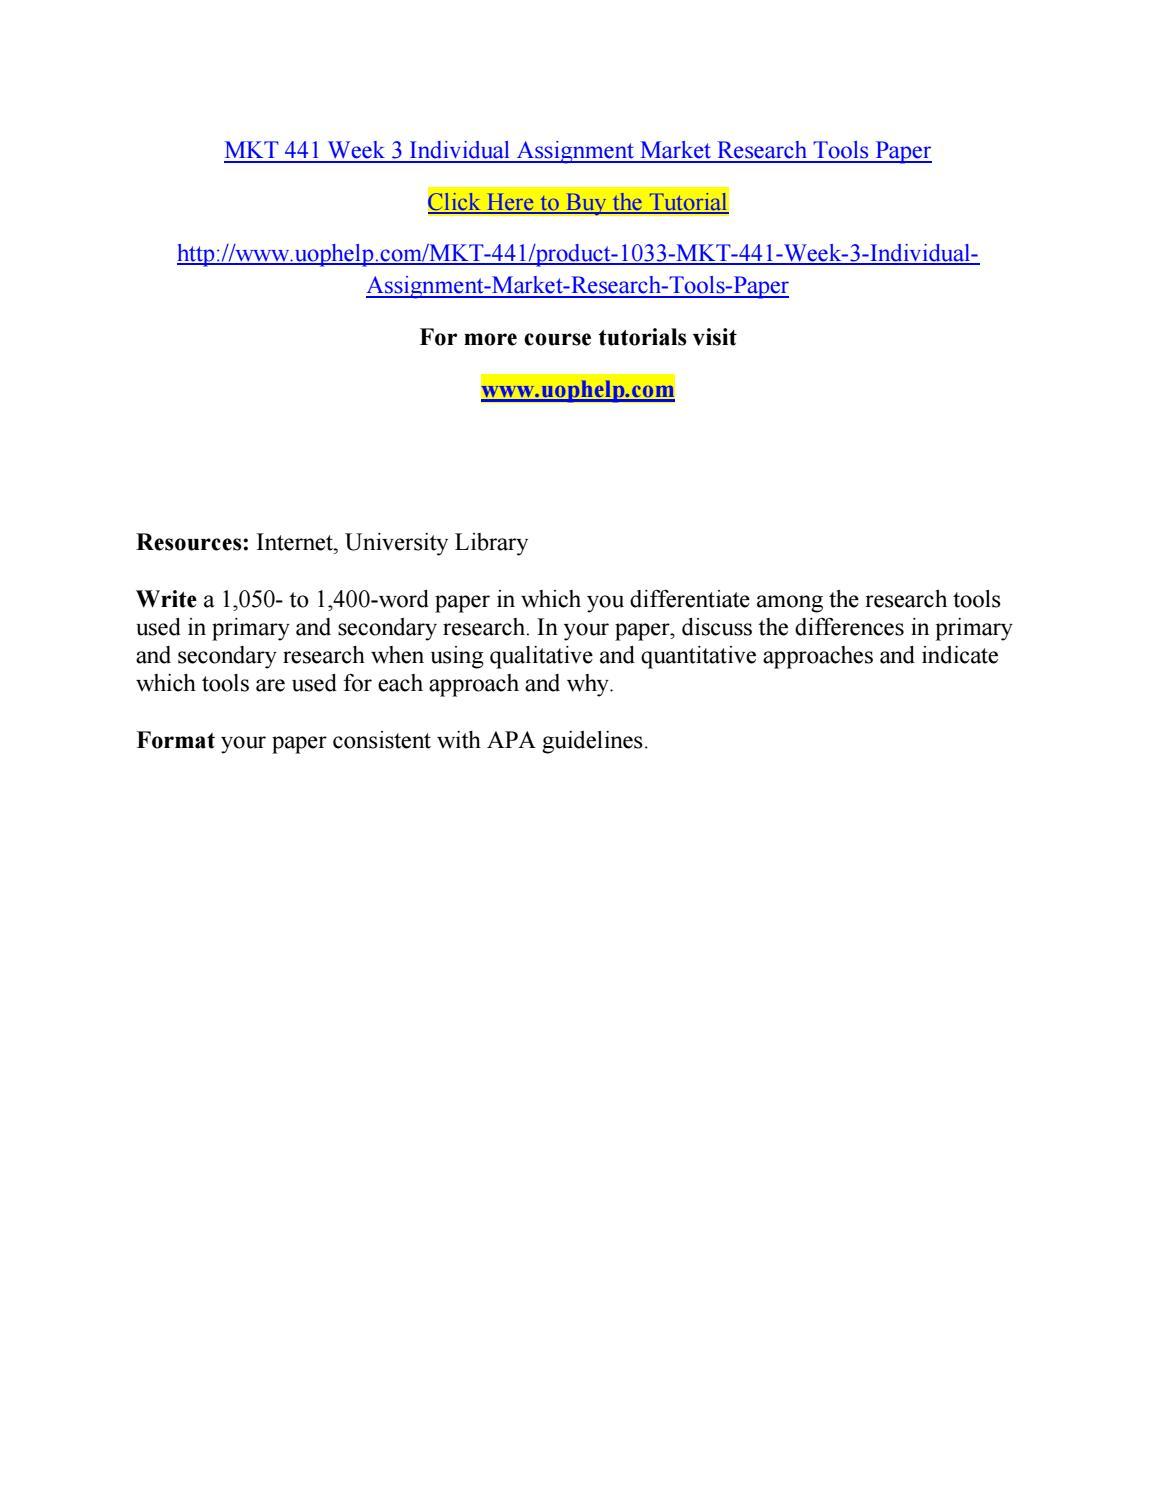 market research essay